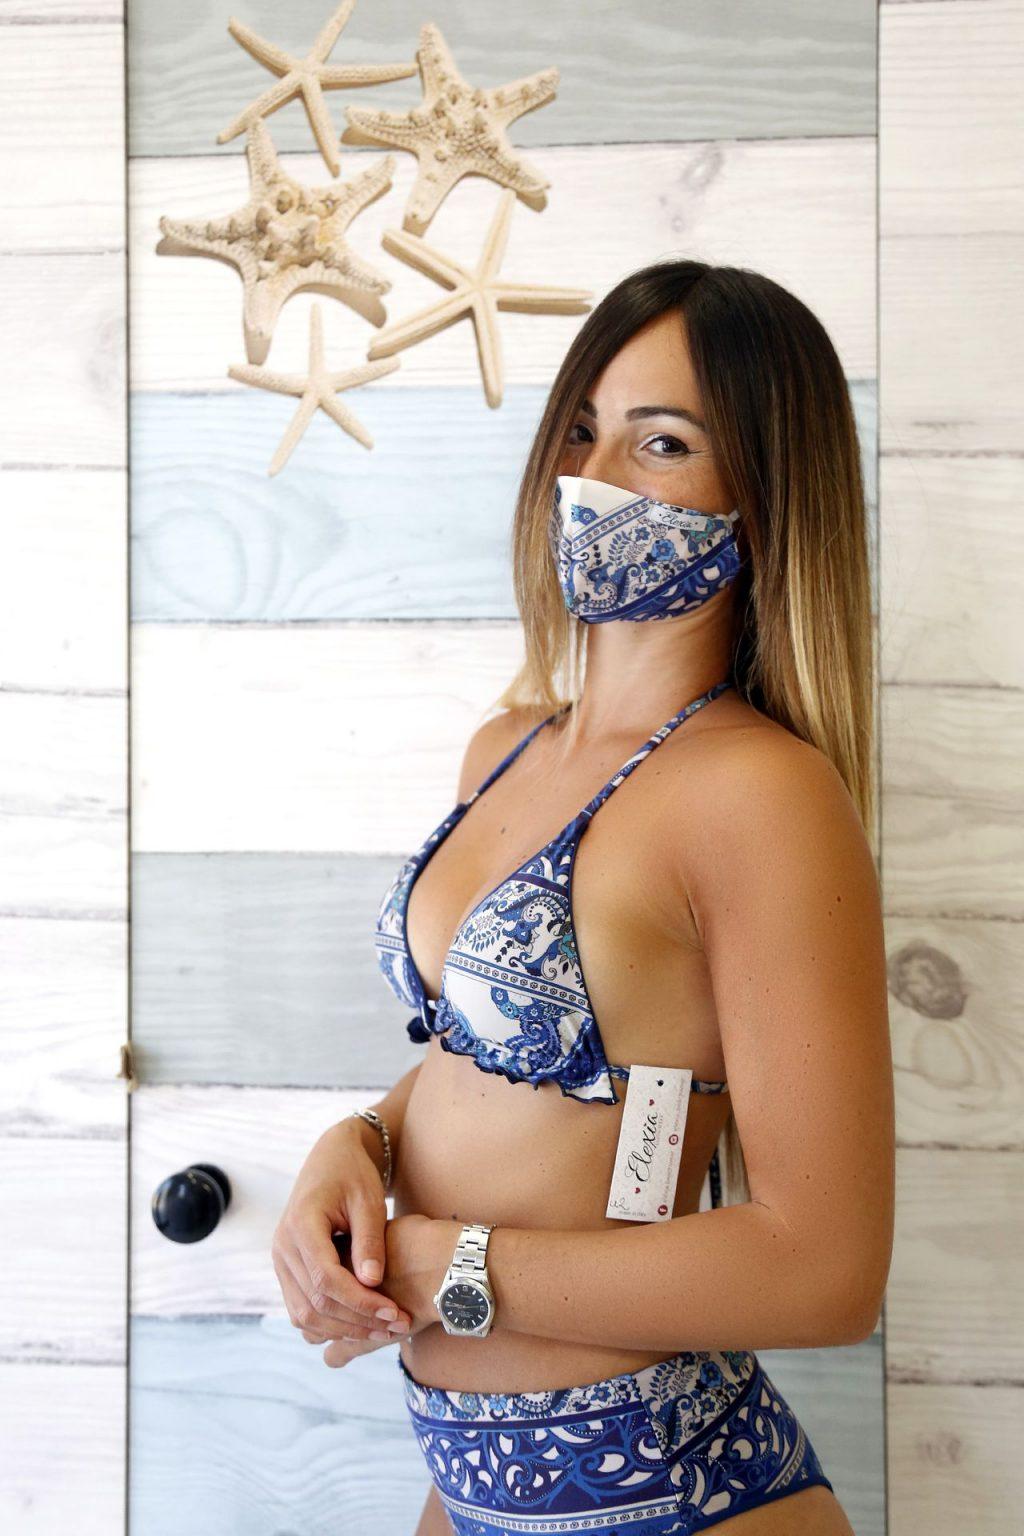 Tiziana Scaramuzzo Presents Her Trikini (22 Photos)